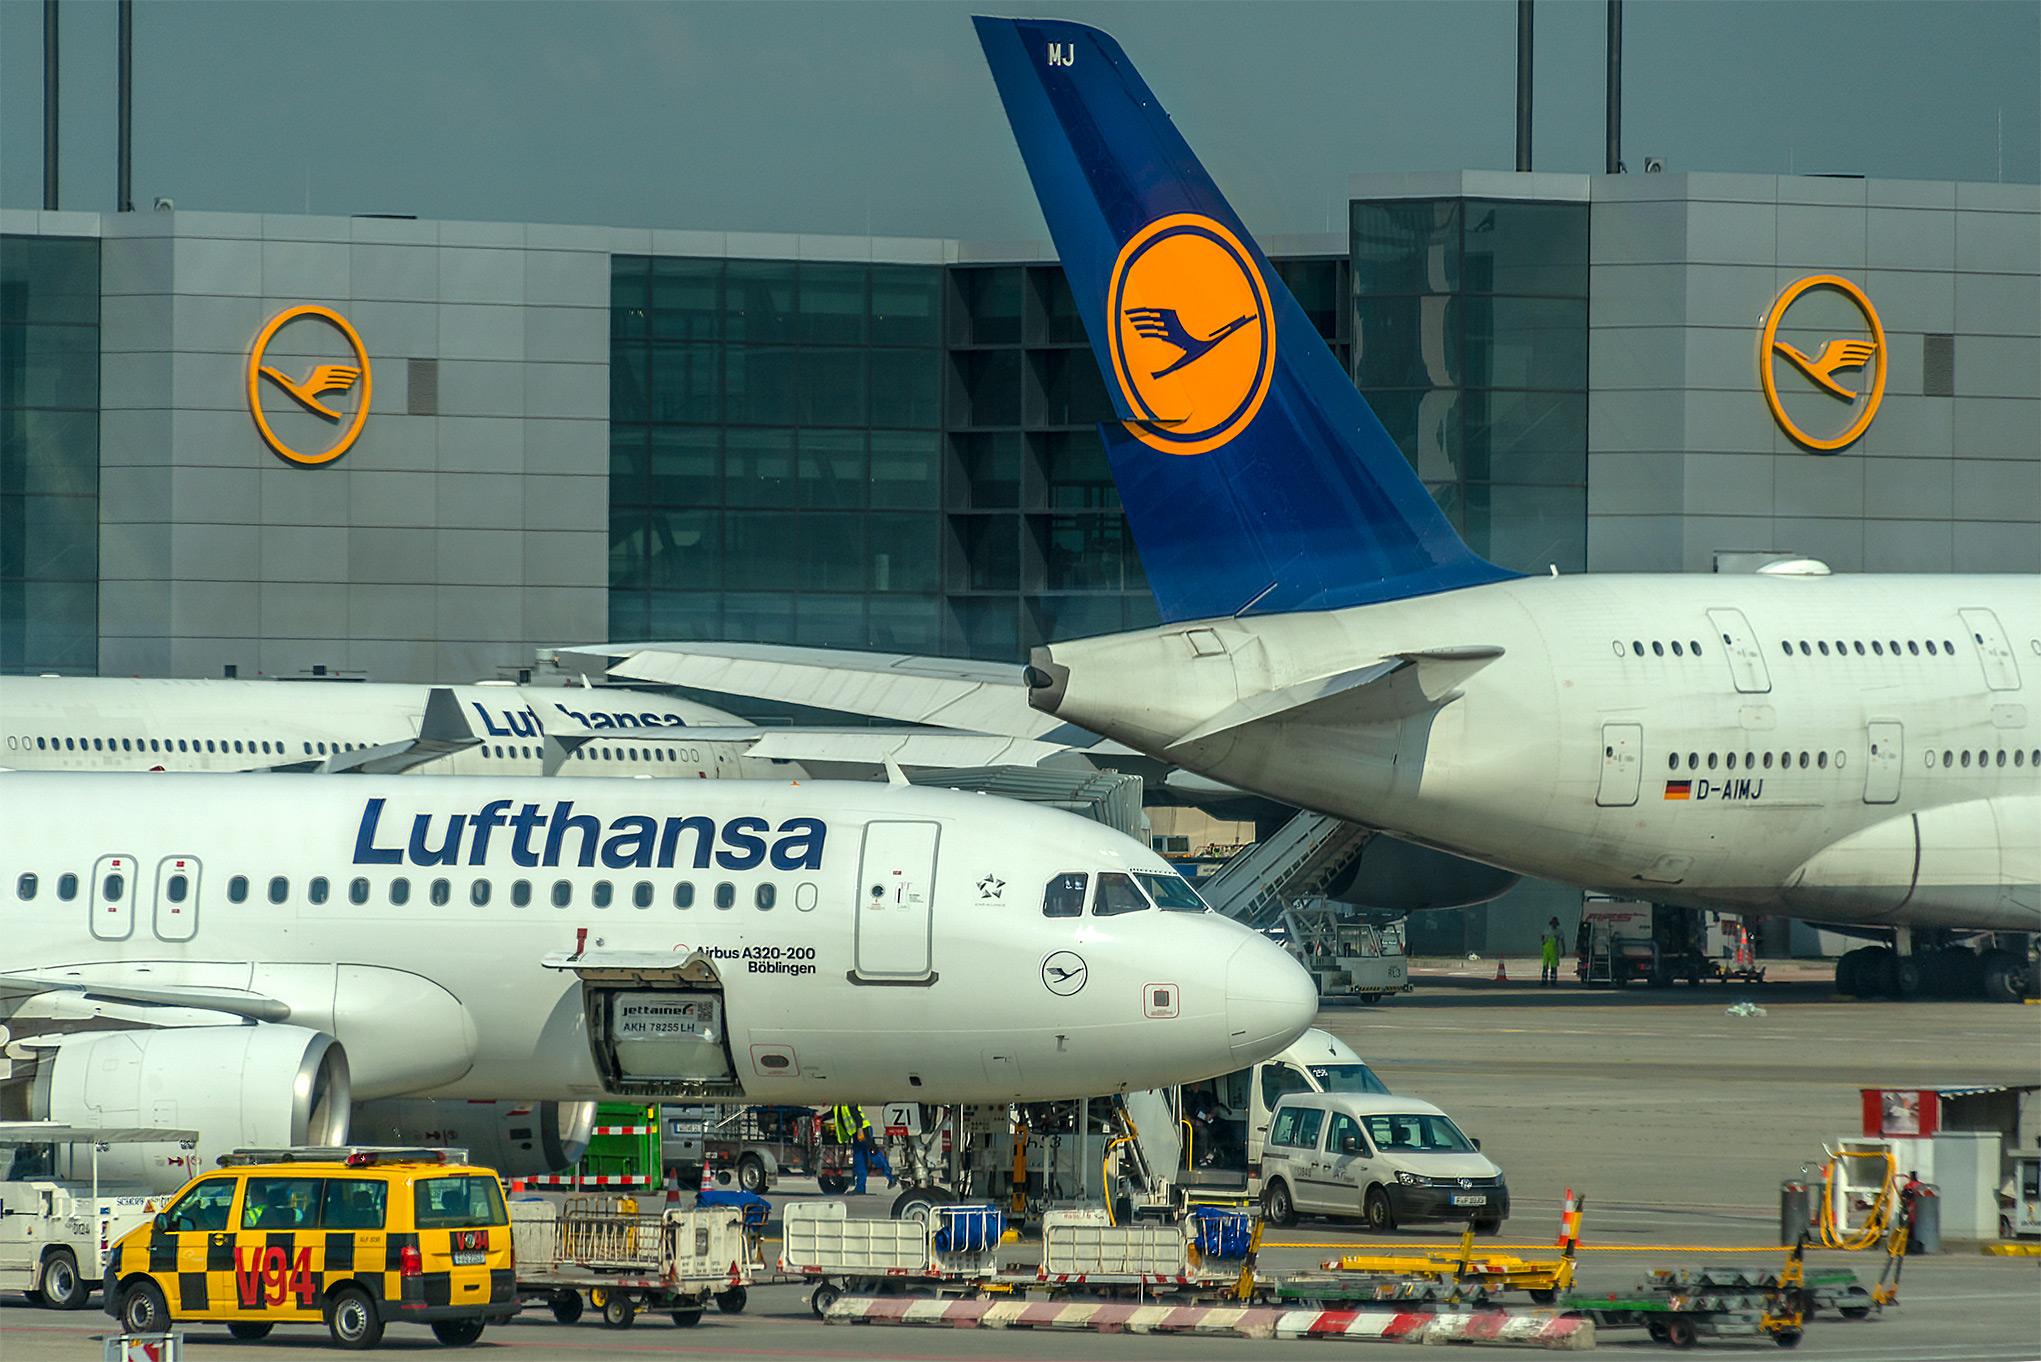 Frankfurt airport & Lufthansa aircraft